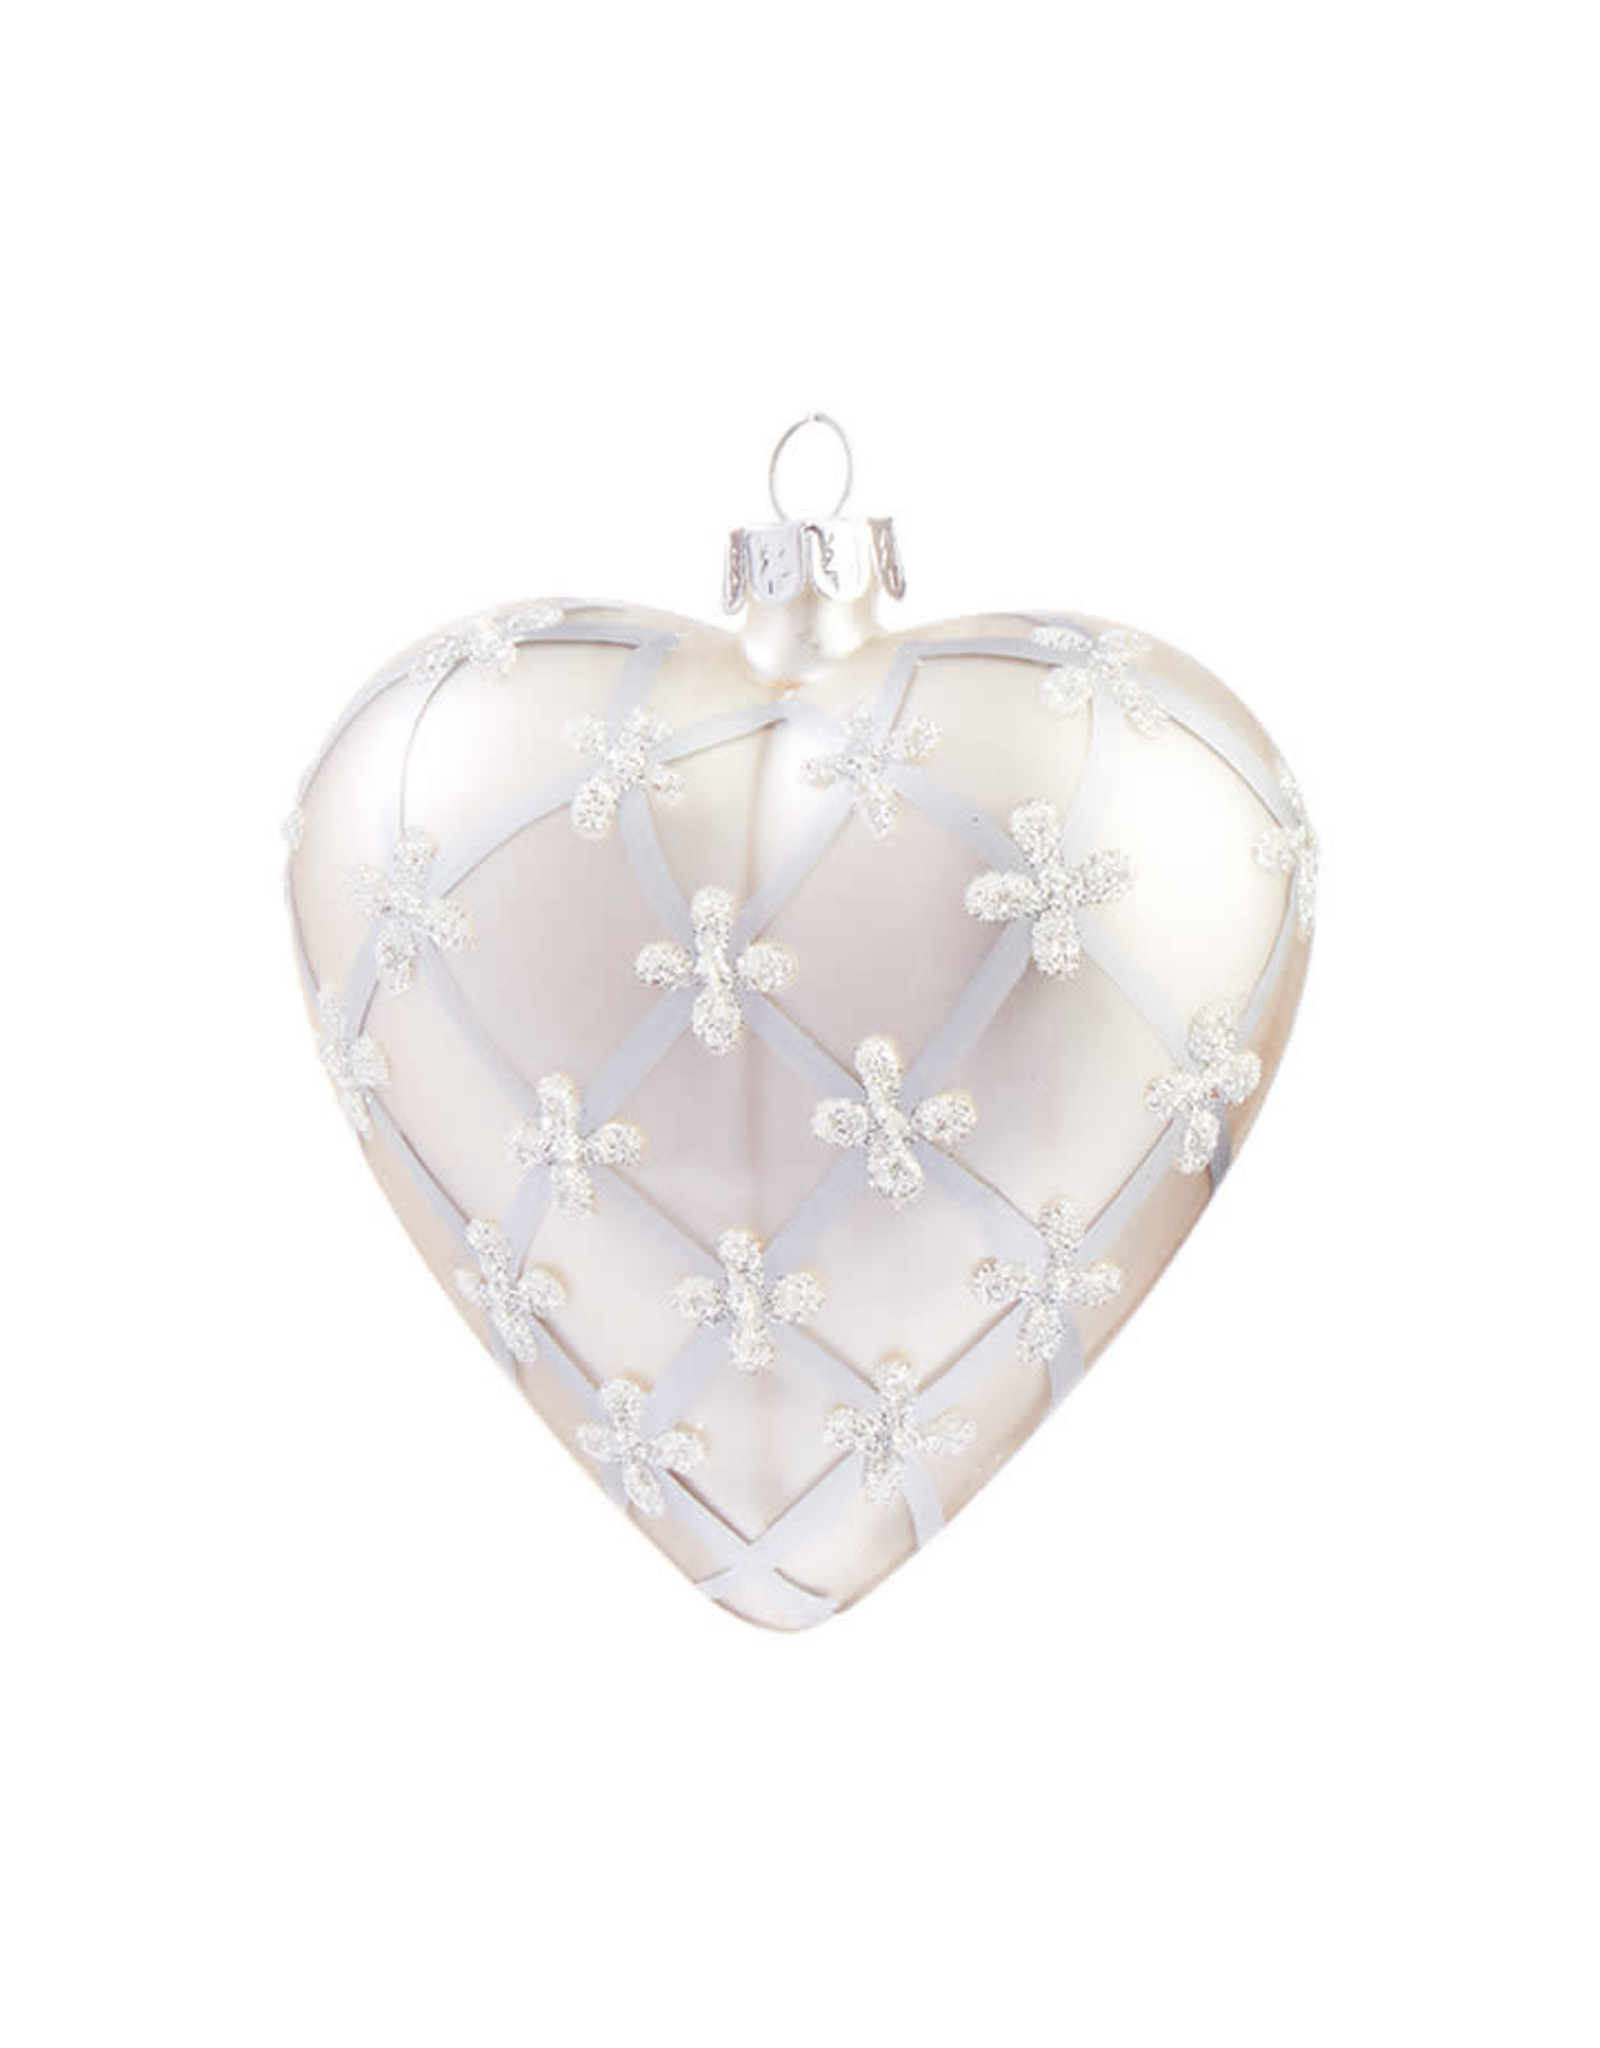 Raz Imports HEART ORNAMENT